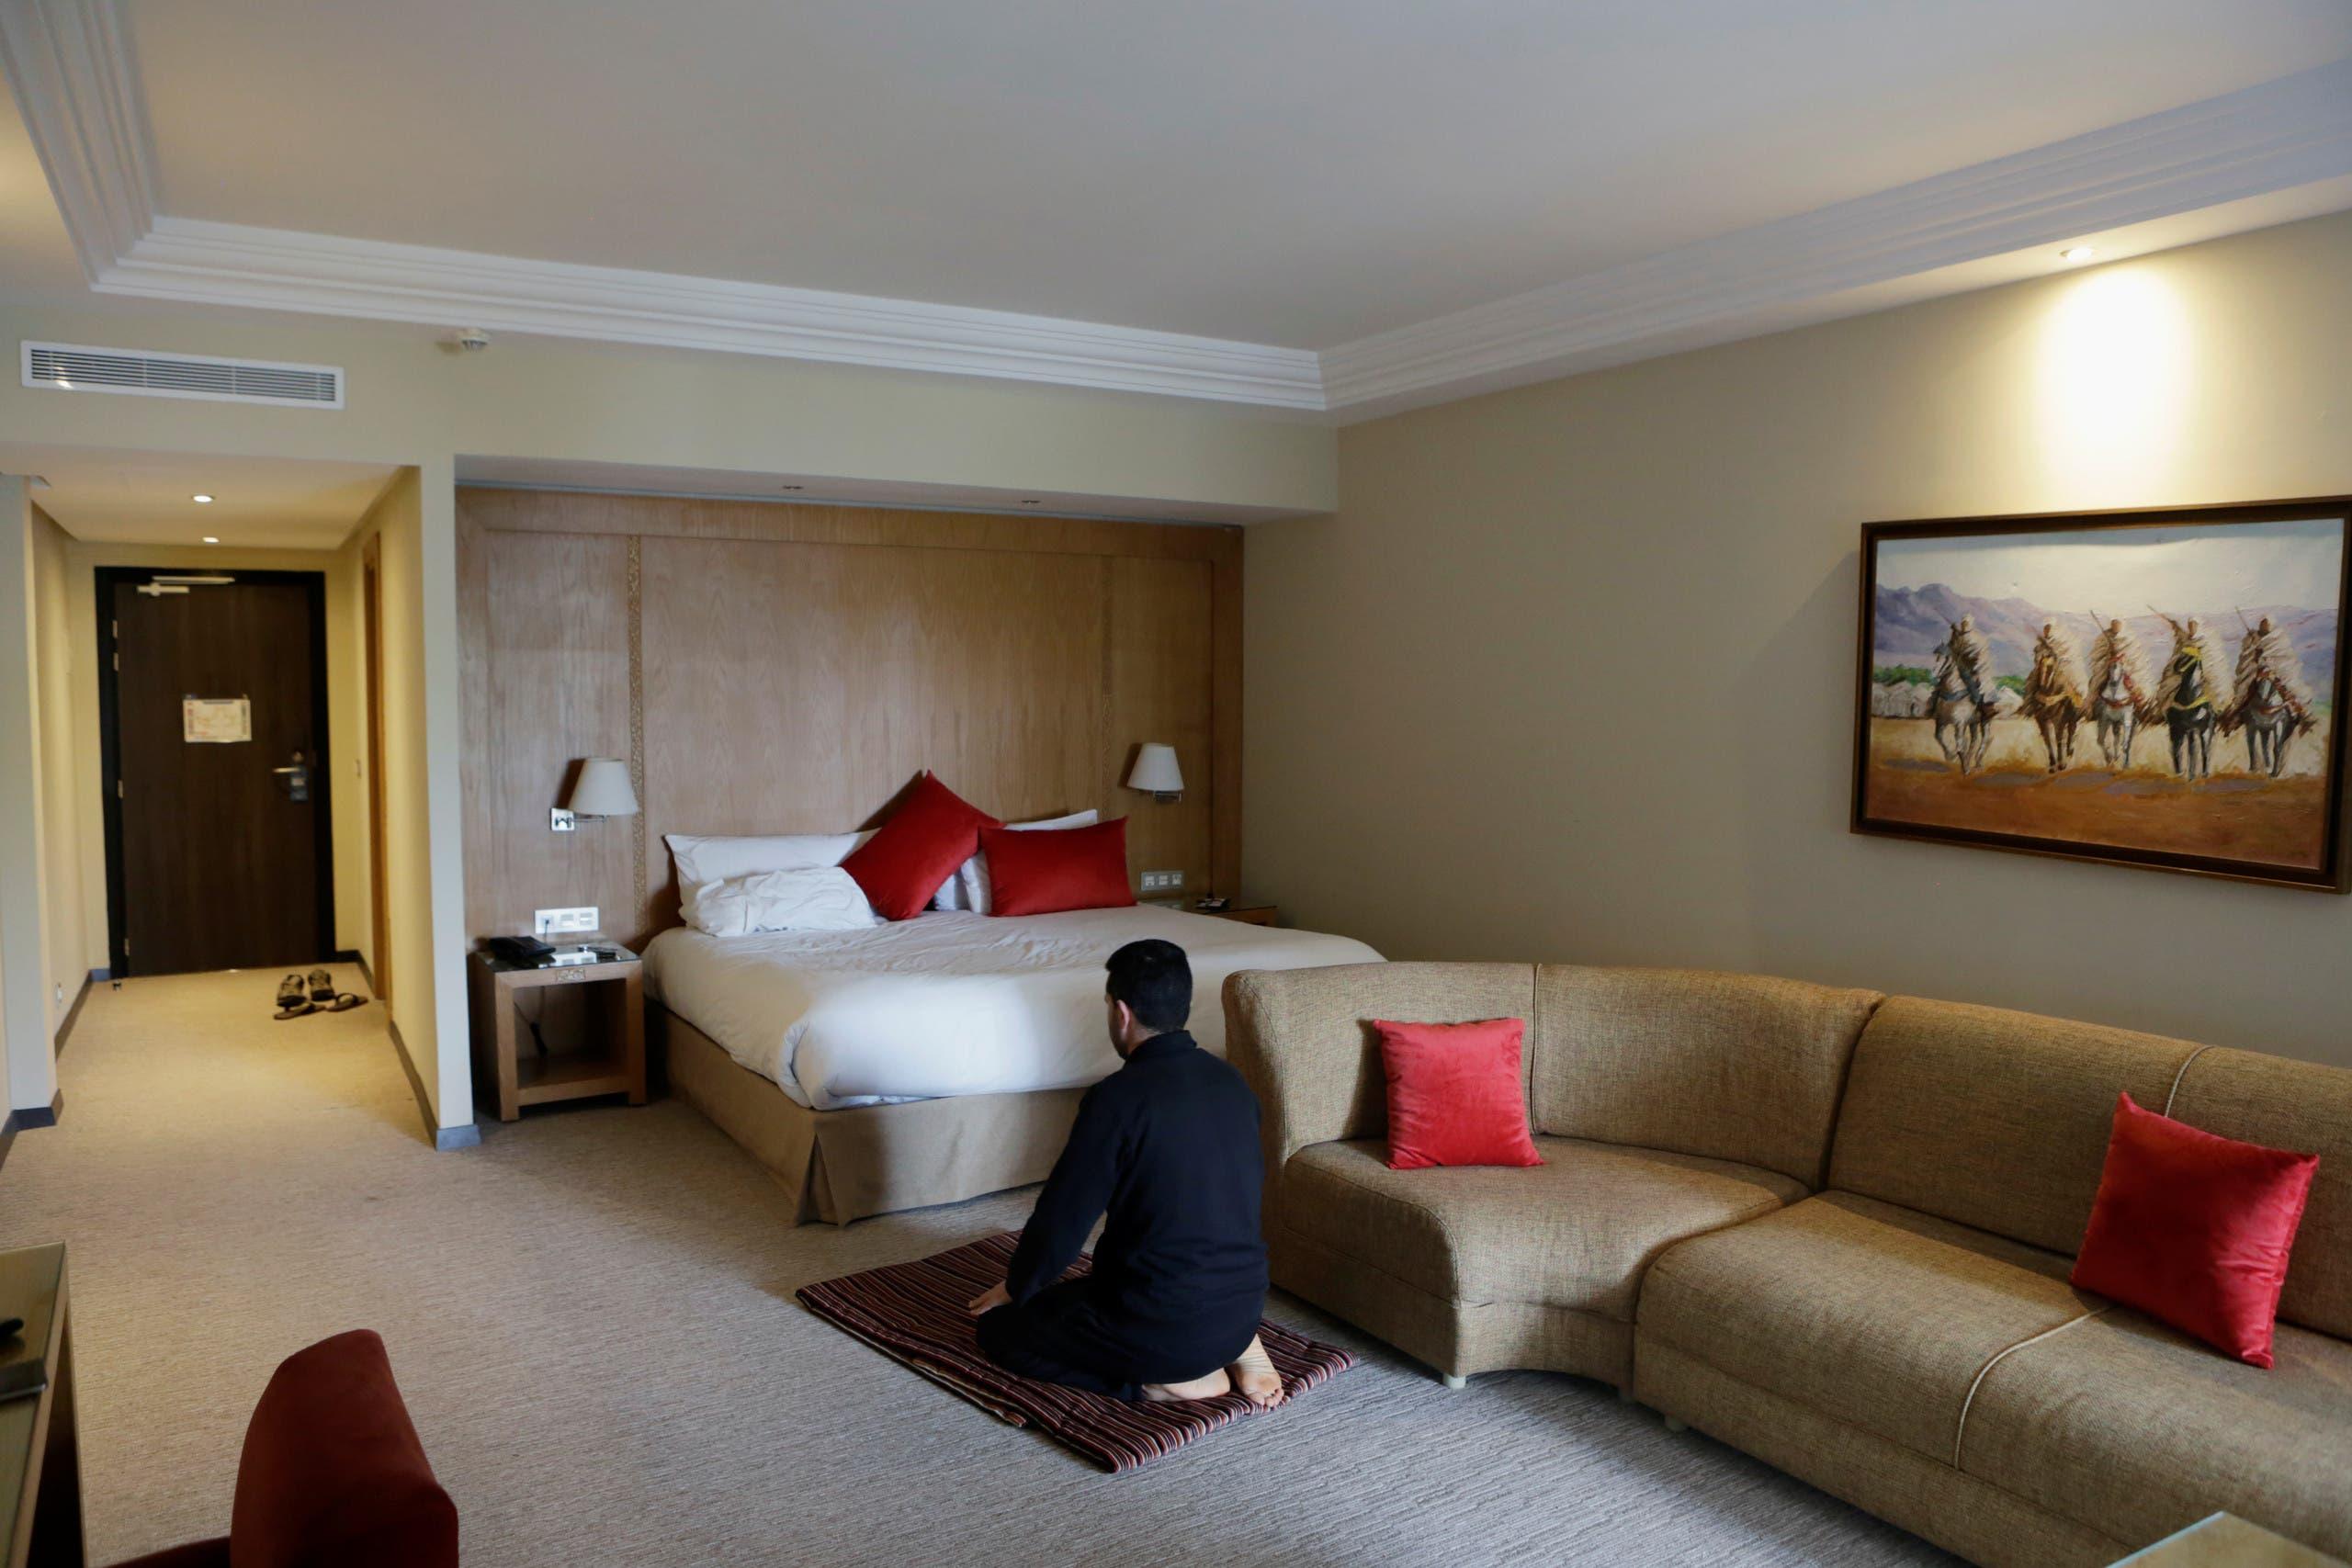 Nurse anesthetist Jamal Bekali, prays in his room at the hotel Dawliz in Sale. (Reuters)